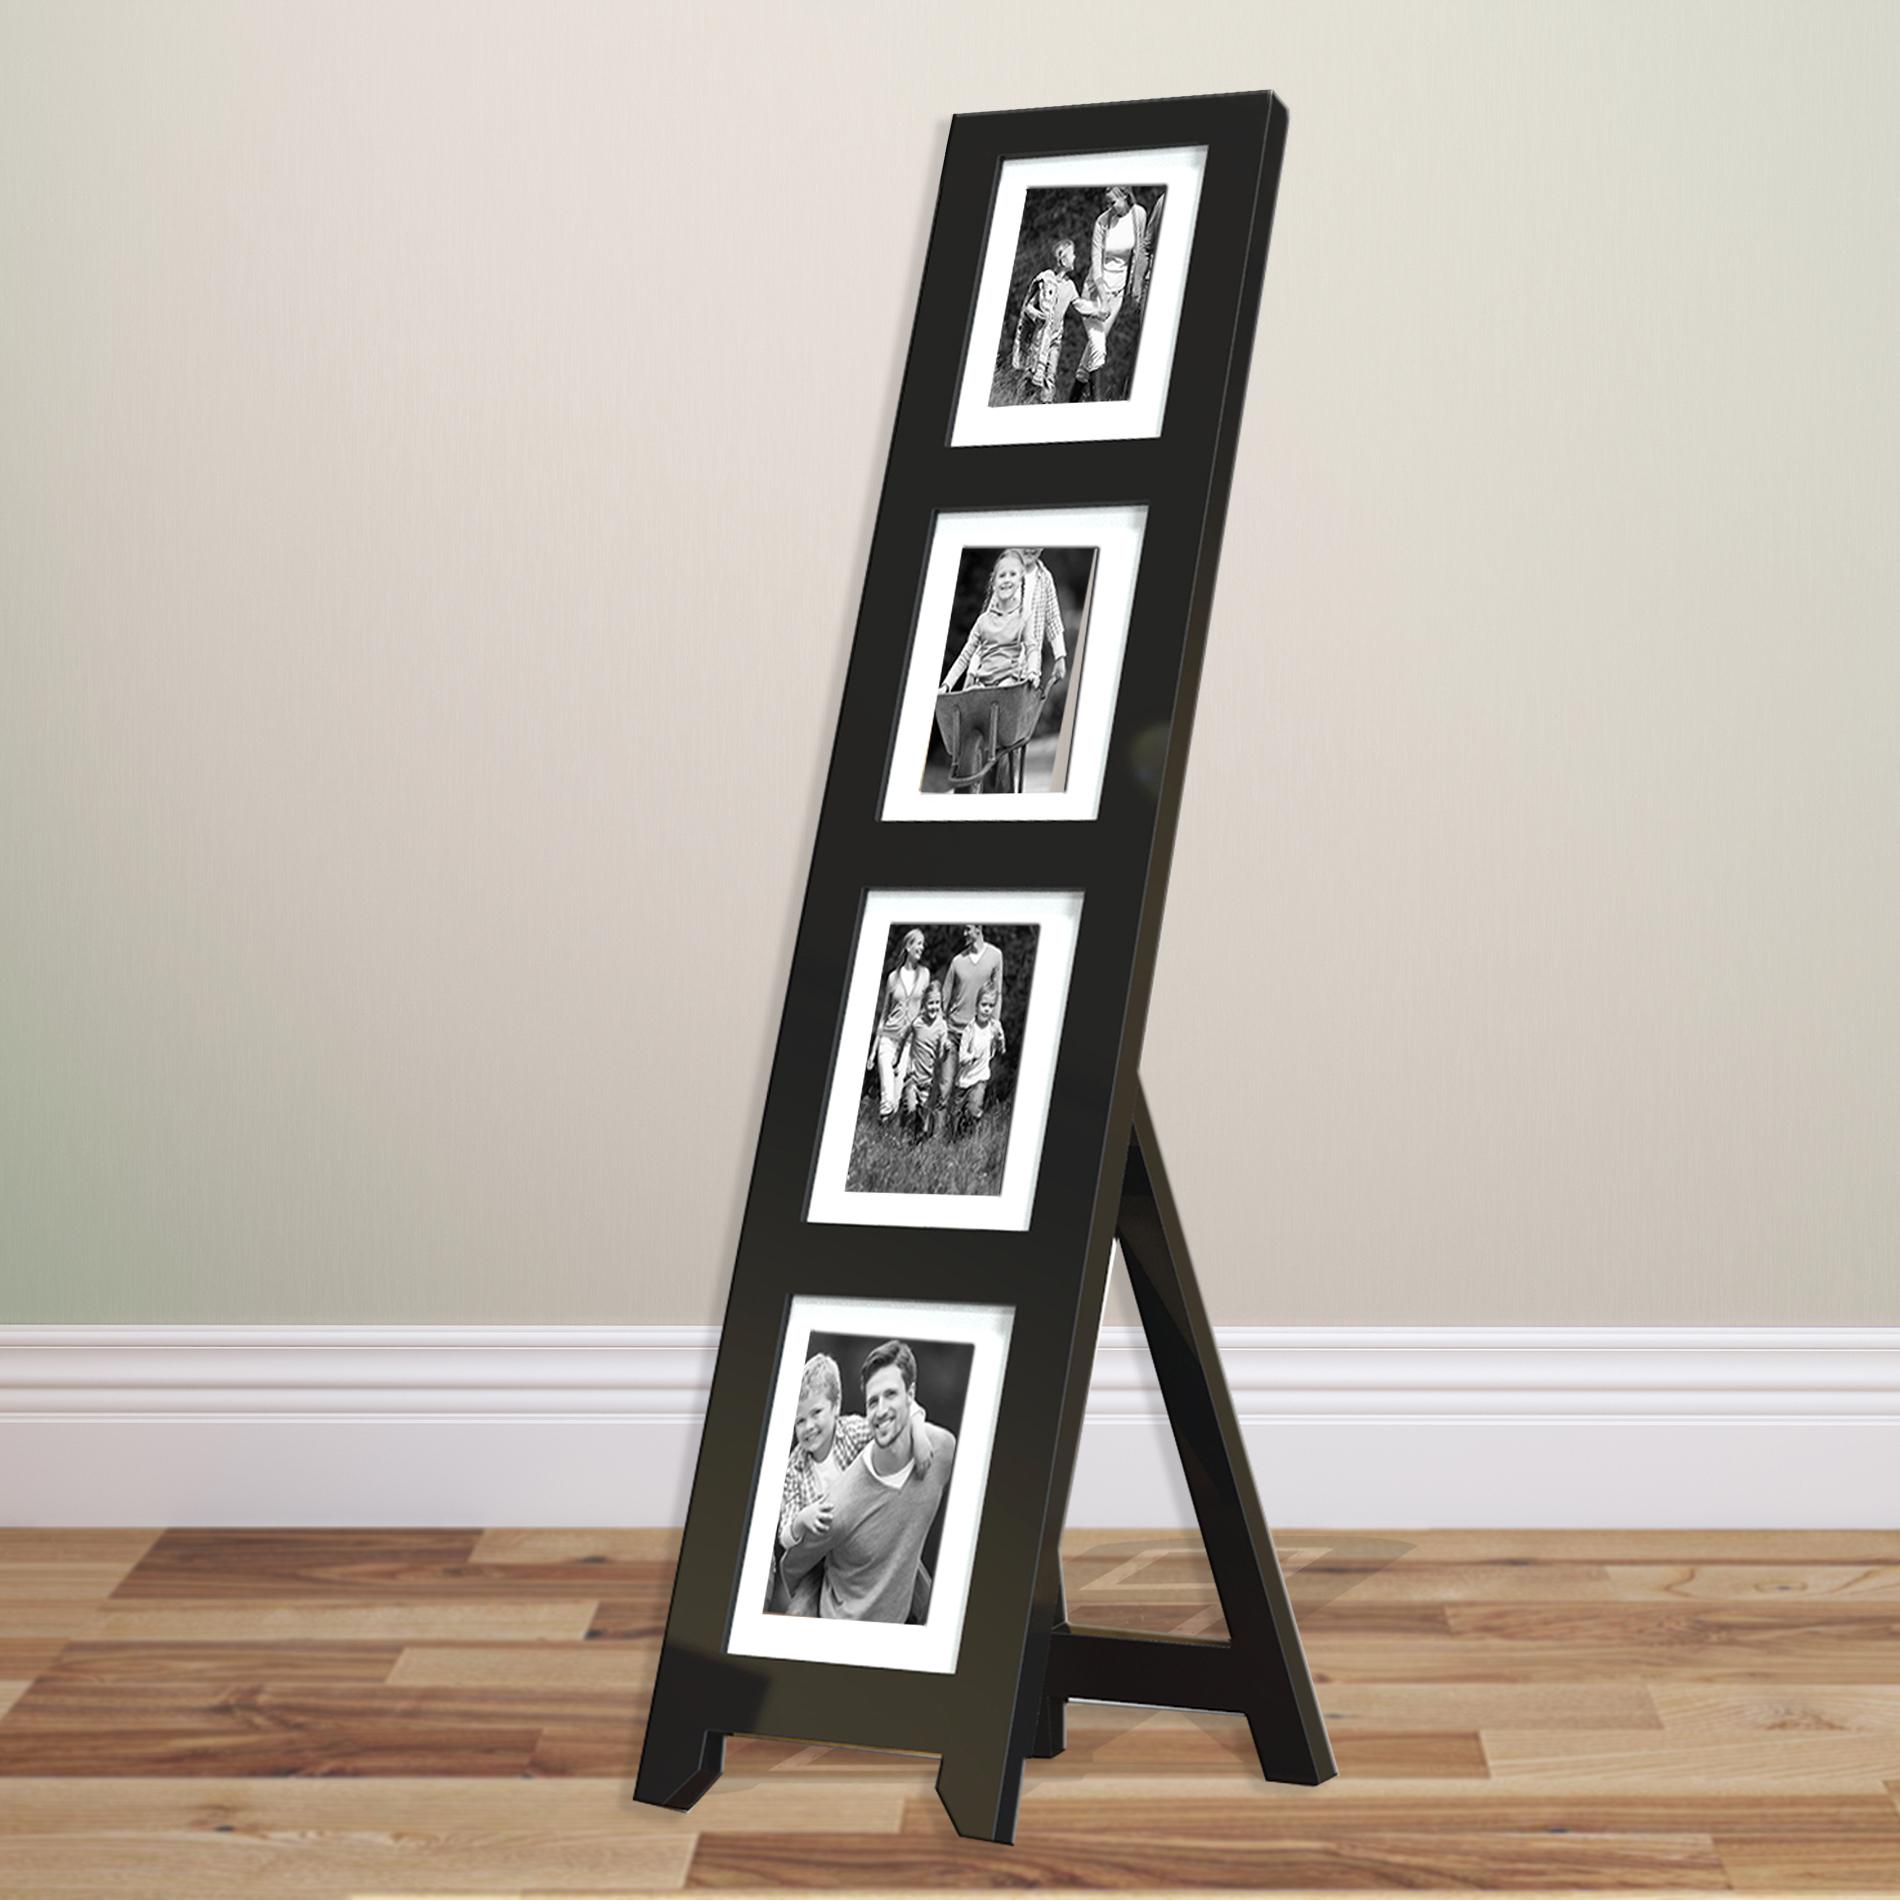 Ladder Collage Picture Frame  Easel Back Photo Collage Frame